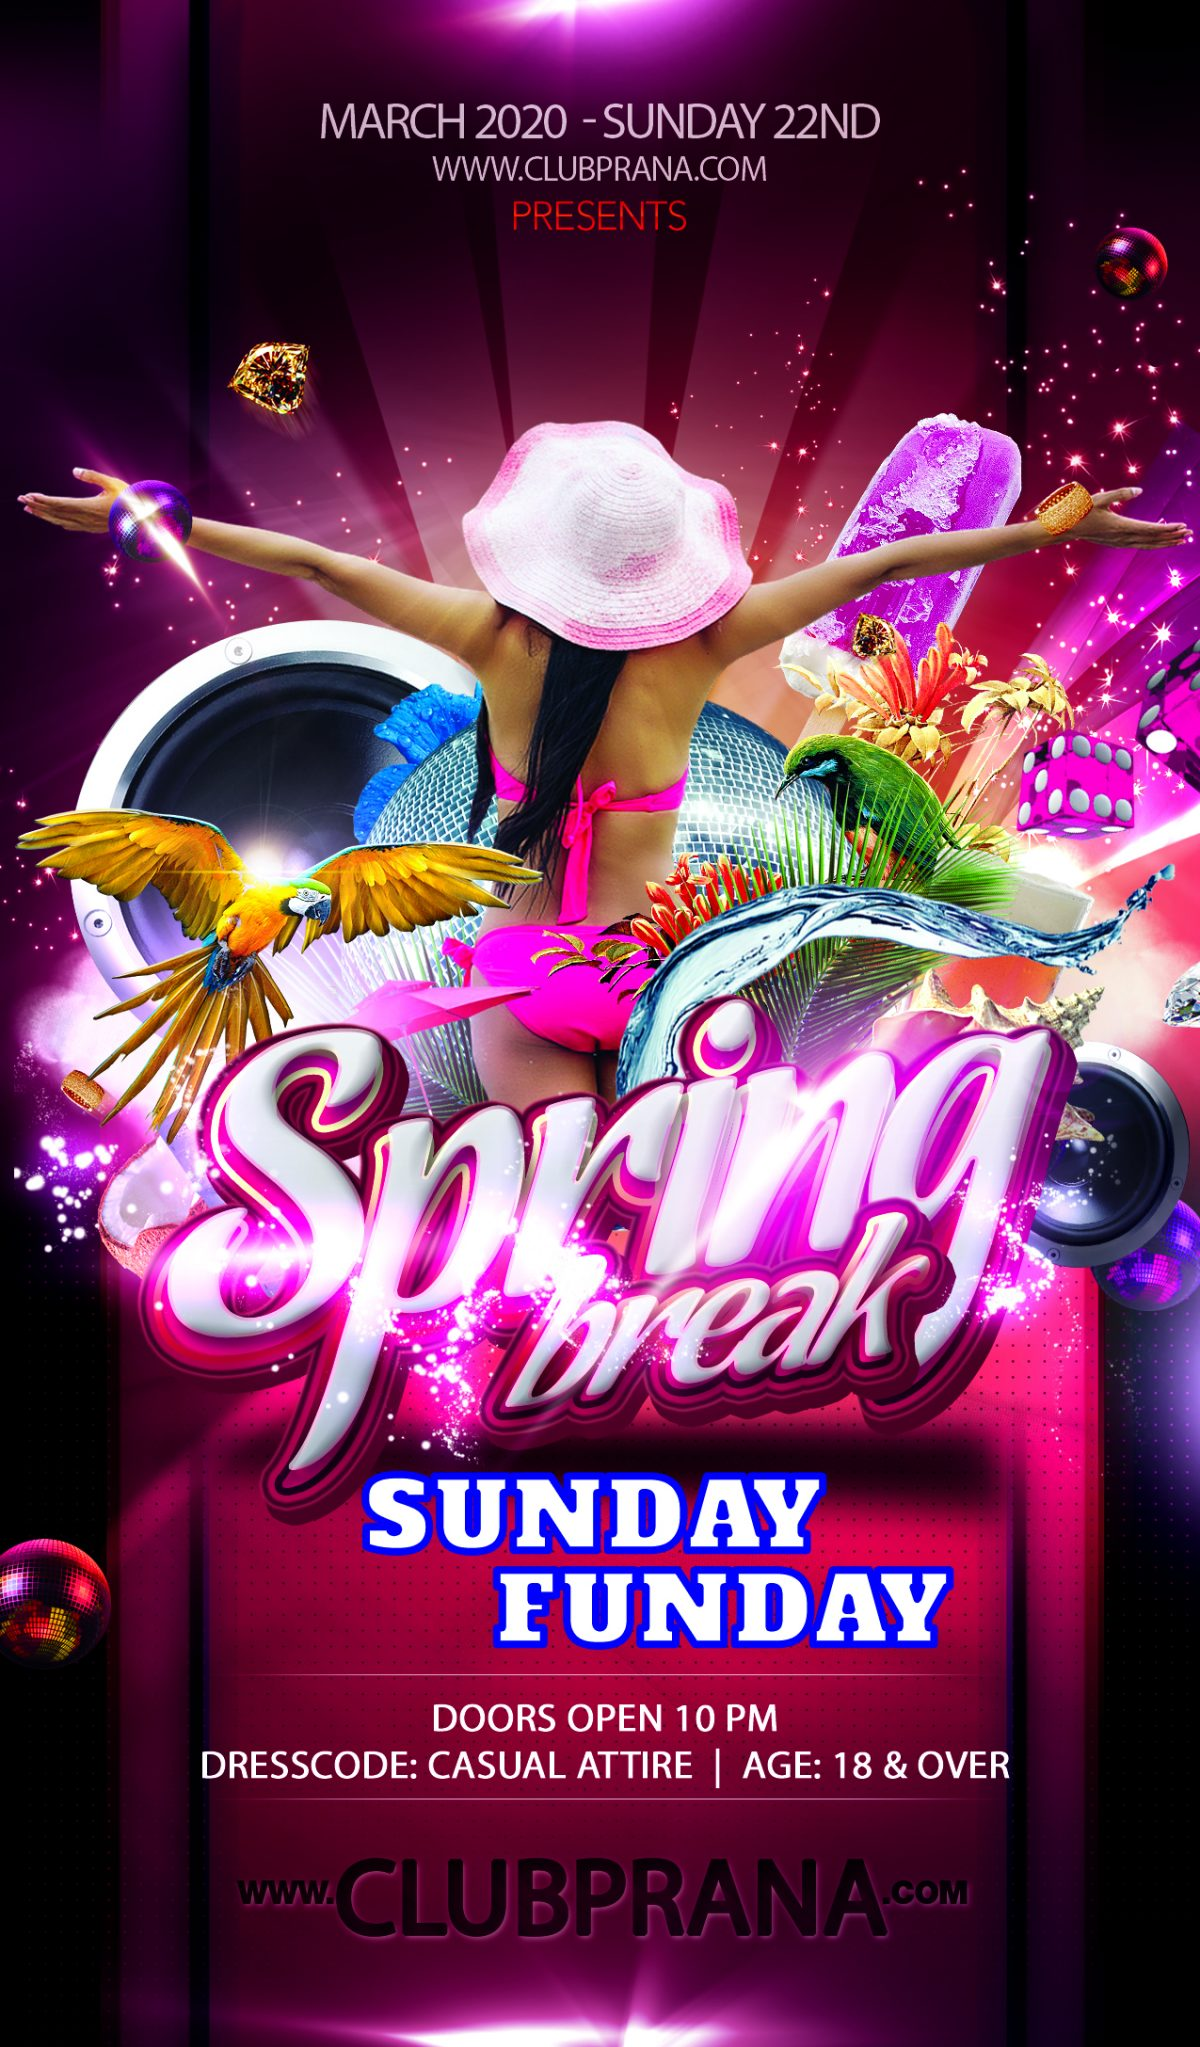 Spring Break: Sunday Funday